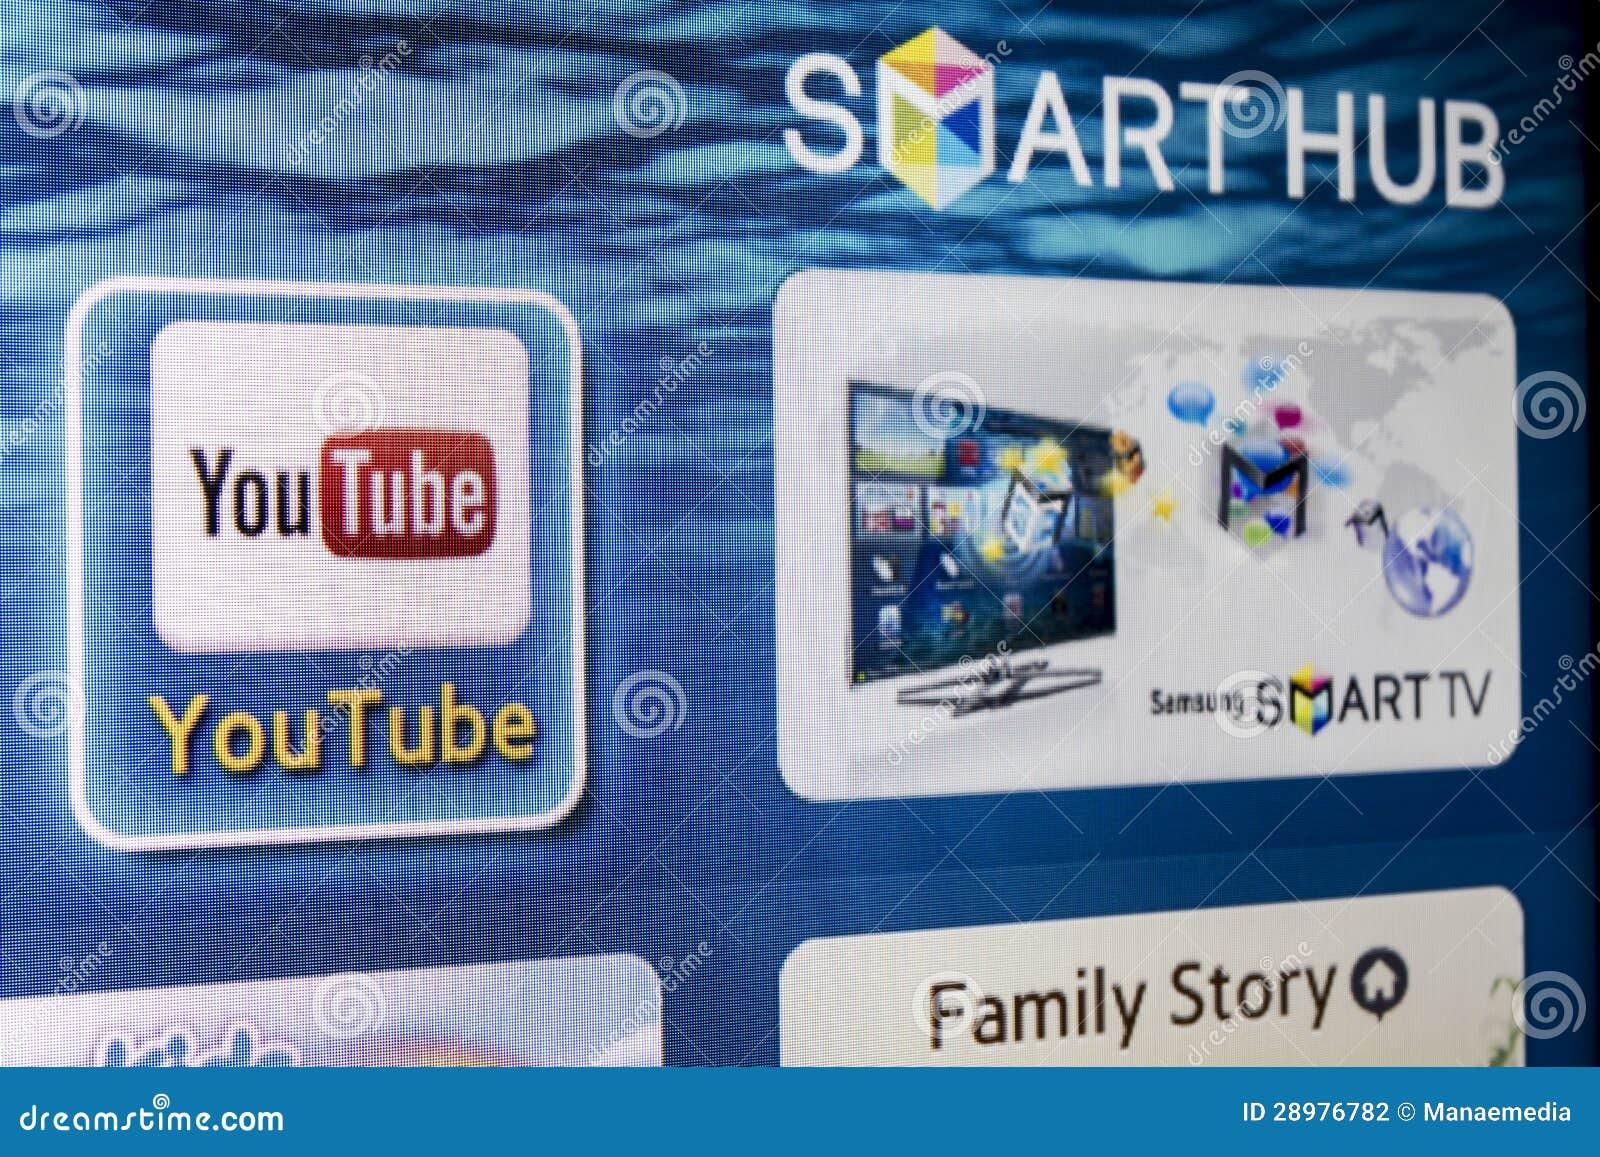 samsung smart tv youtube app herunterladen